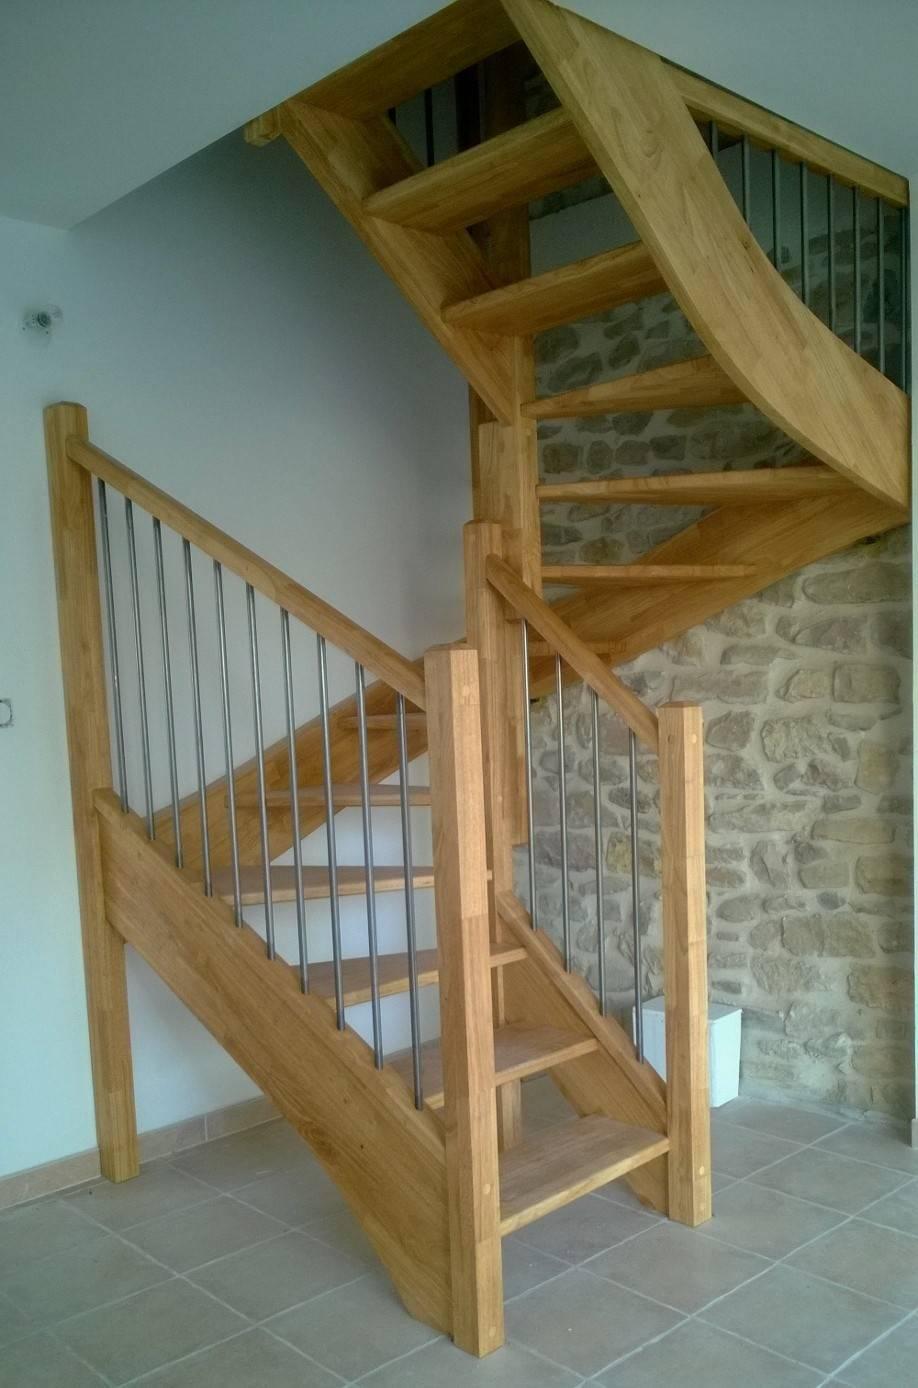 escalier 3 4 tournants en h v a sans contremarche. Black Bedroom Furniture Sets. Home Design Ideas